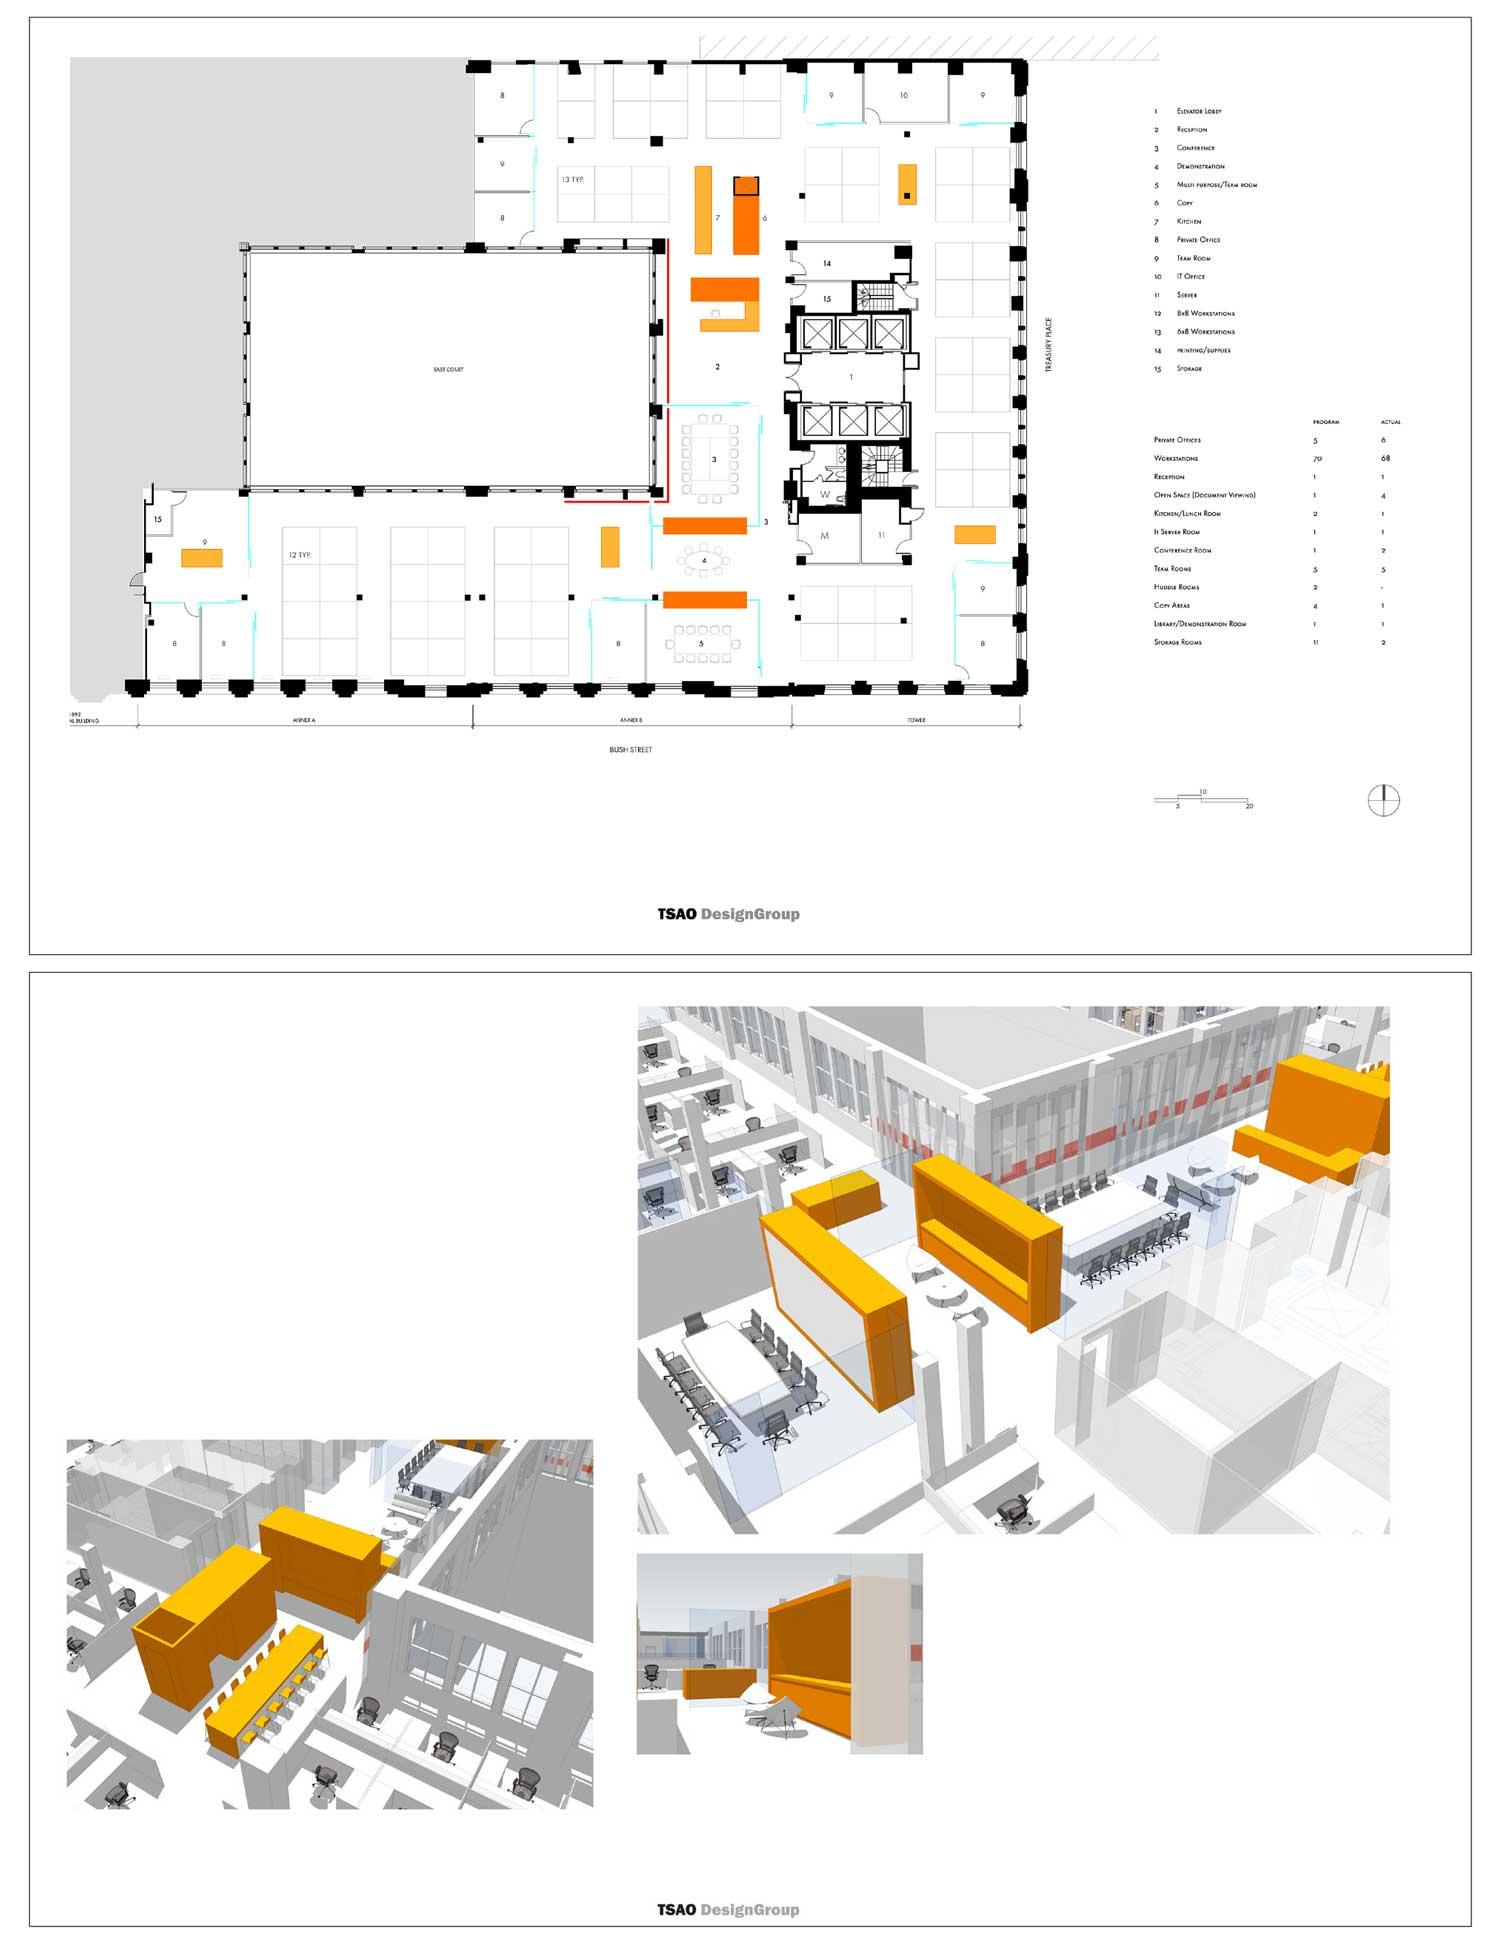 tsao-mazzetti-process-02.jpg